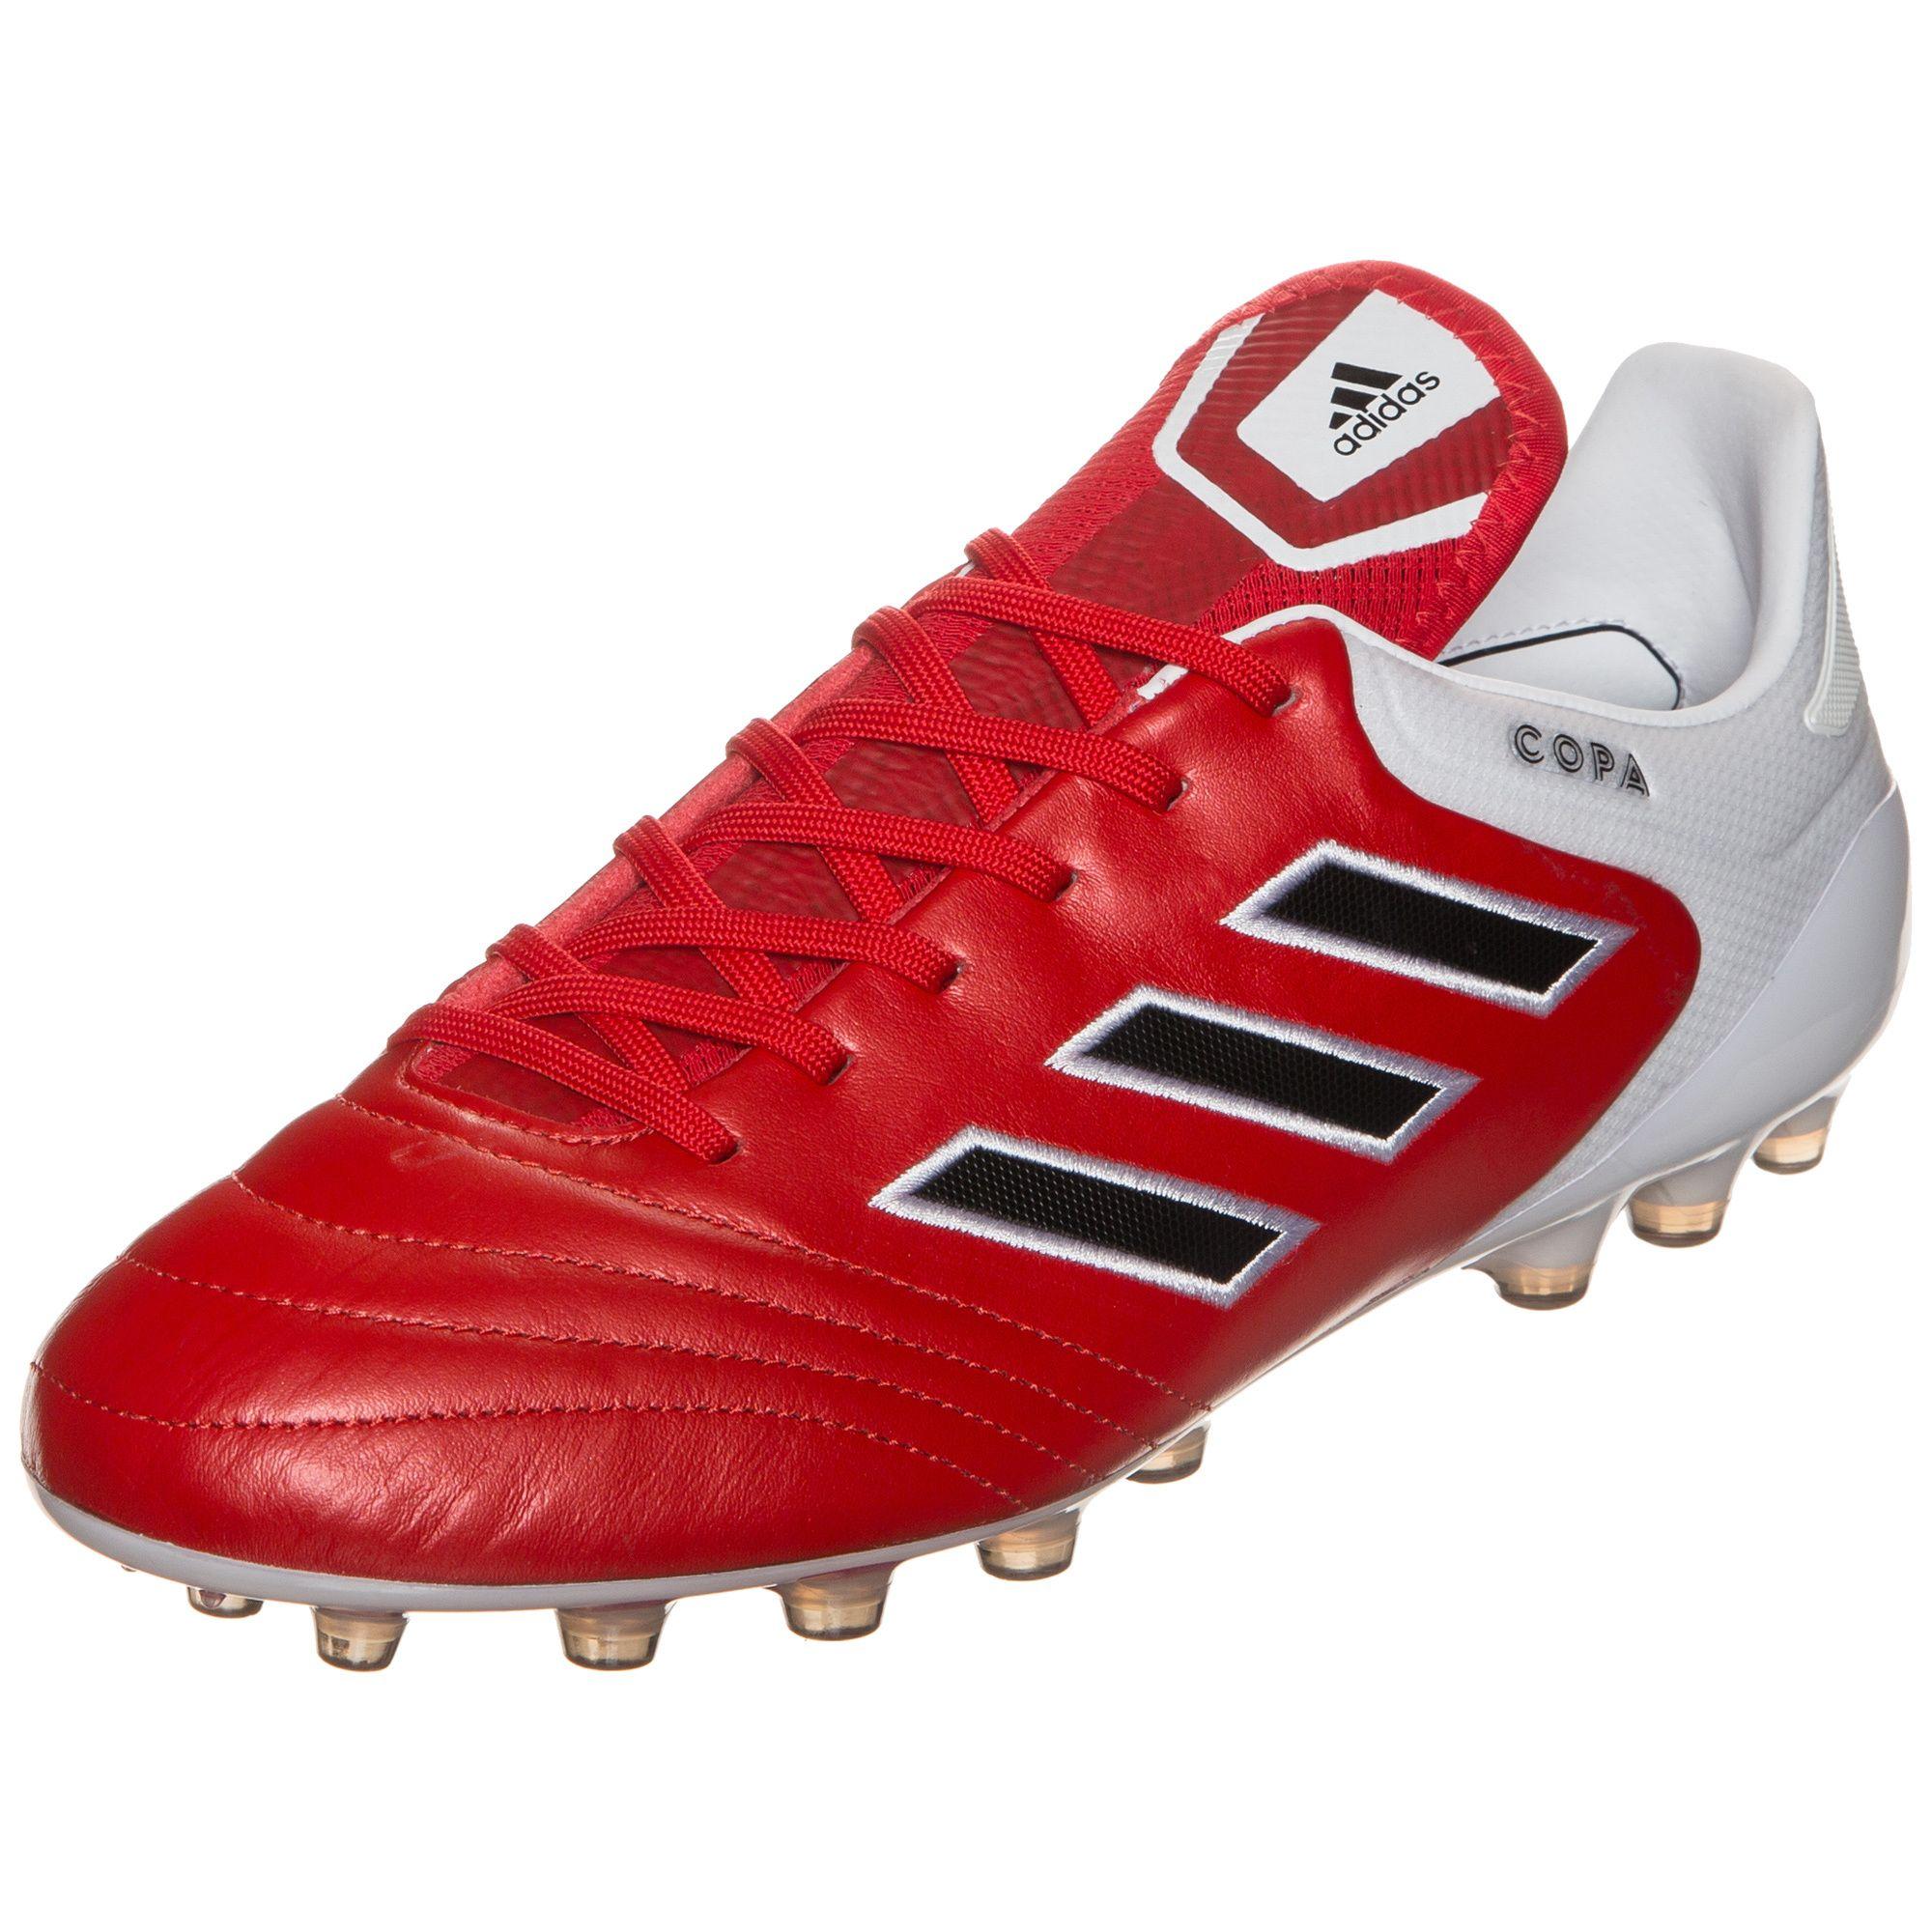 ADIDAS PERFORMANCE adidas Performance Copa 17.1 Red Limit AG Fußballschuh Herren